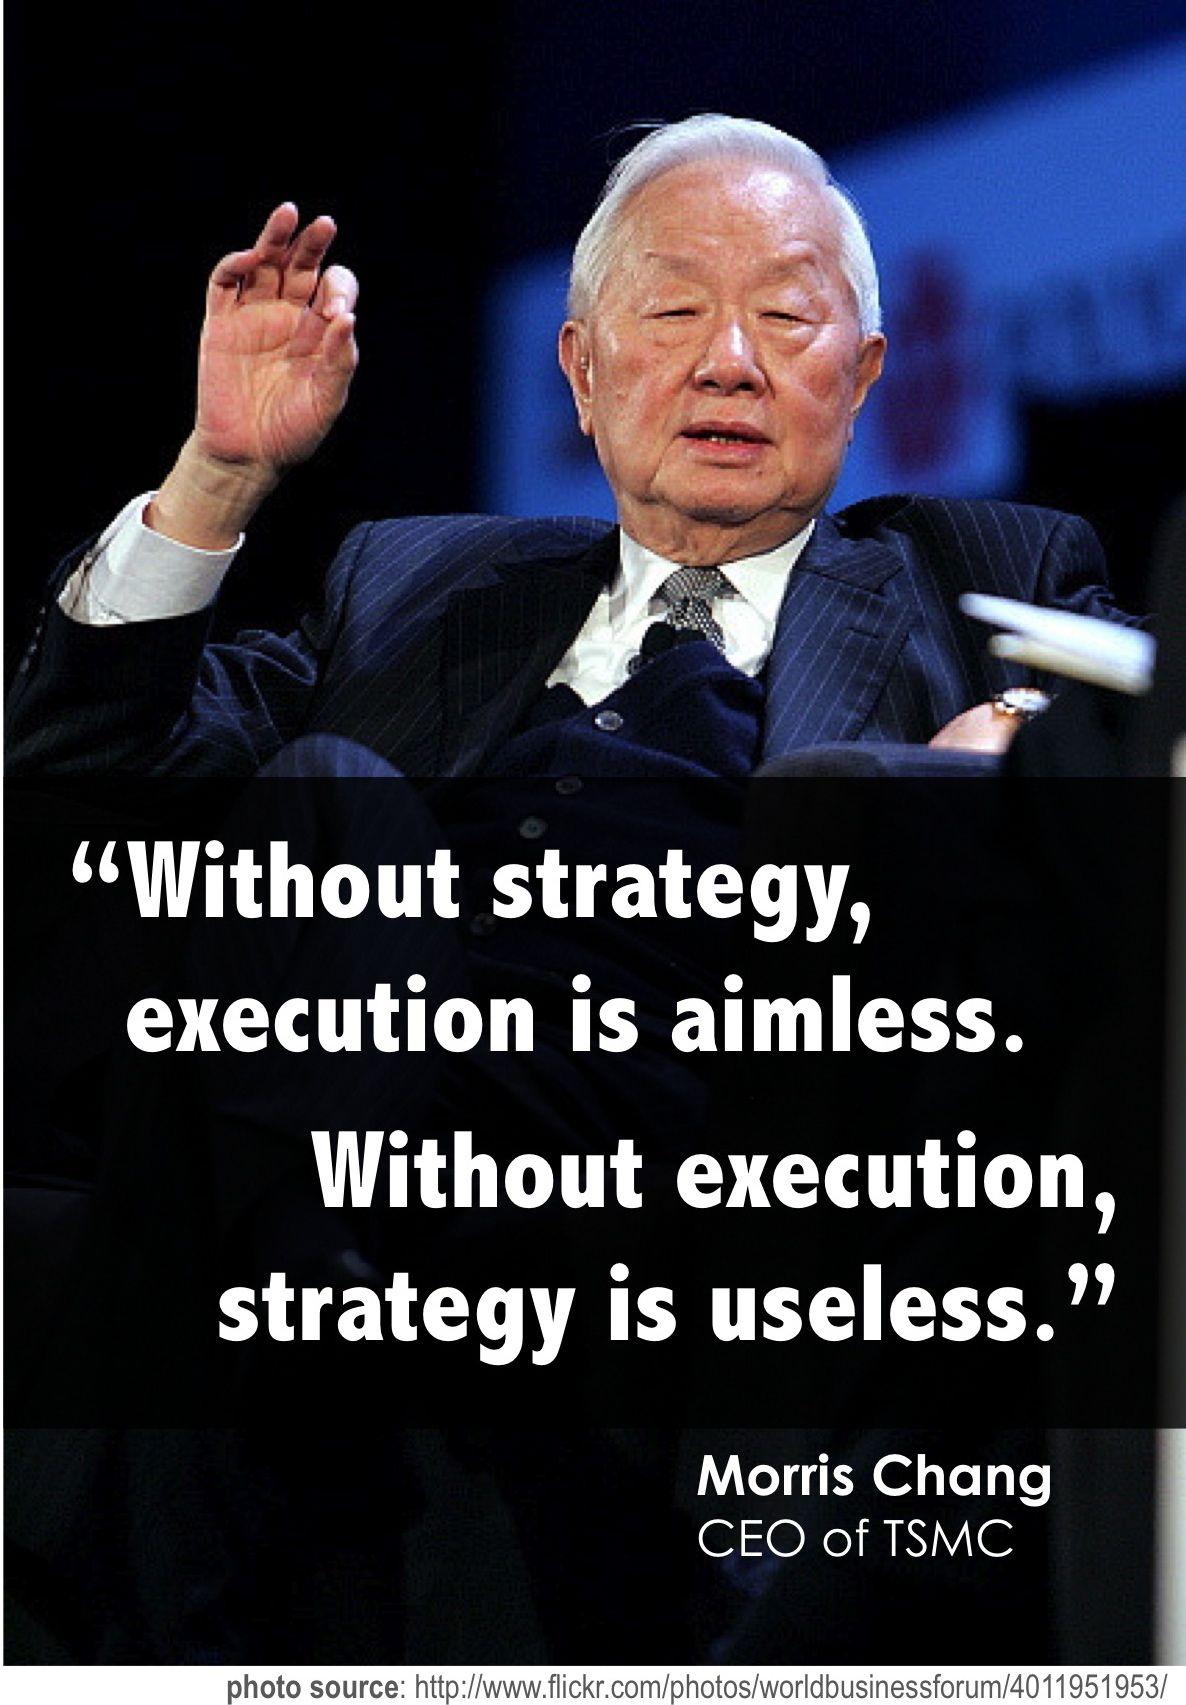 Execute quote #2